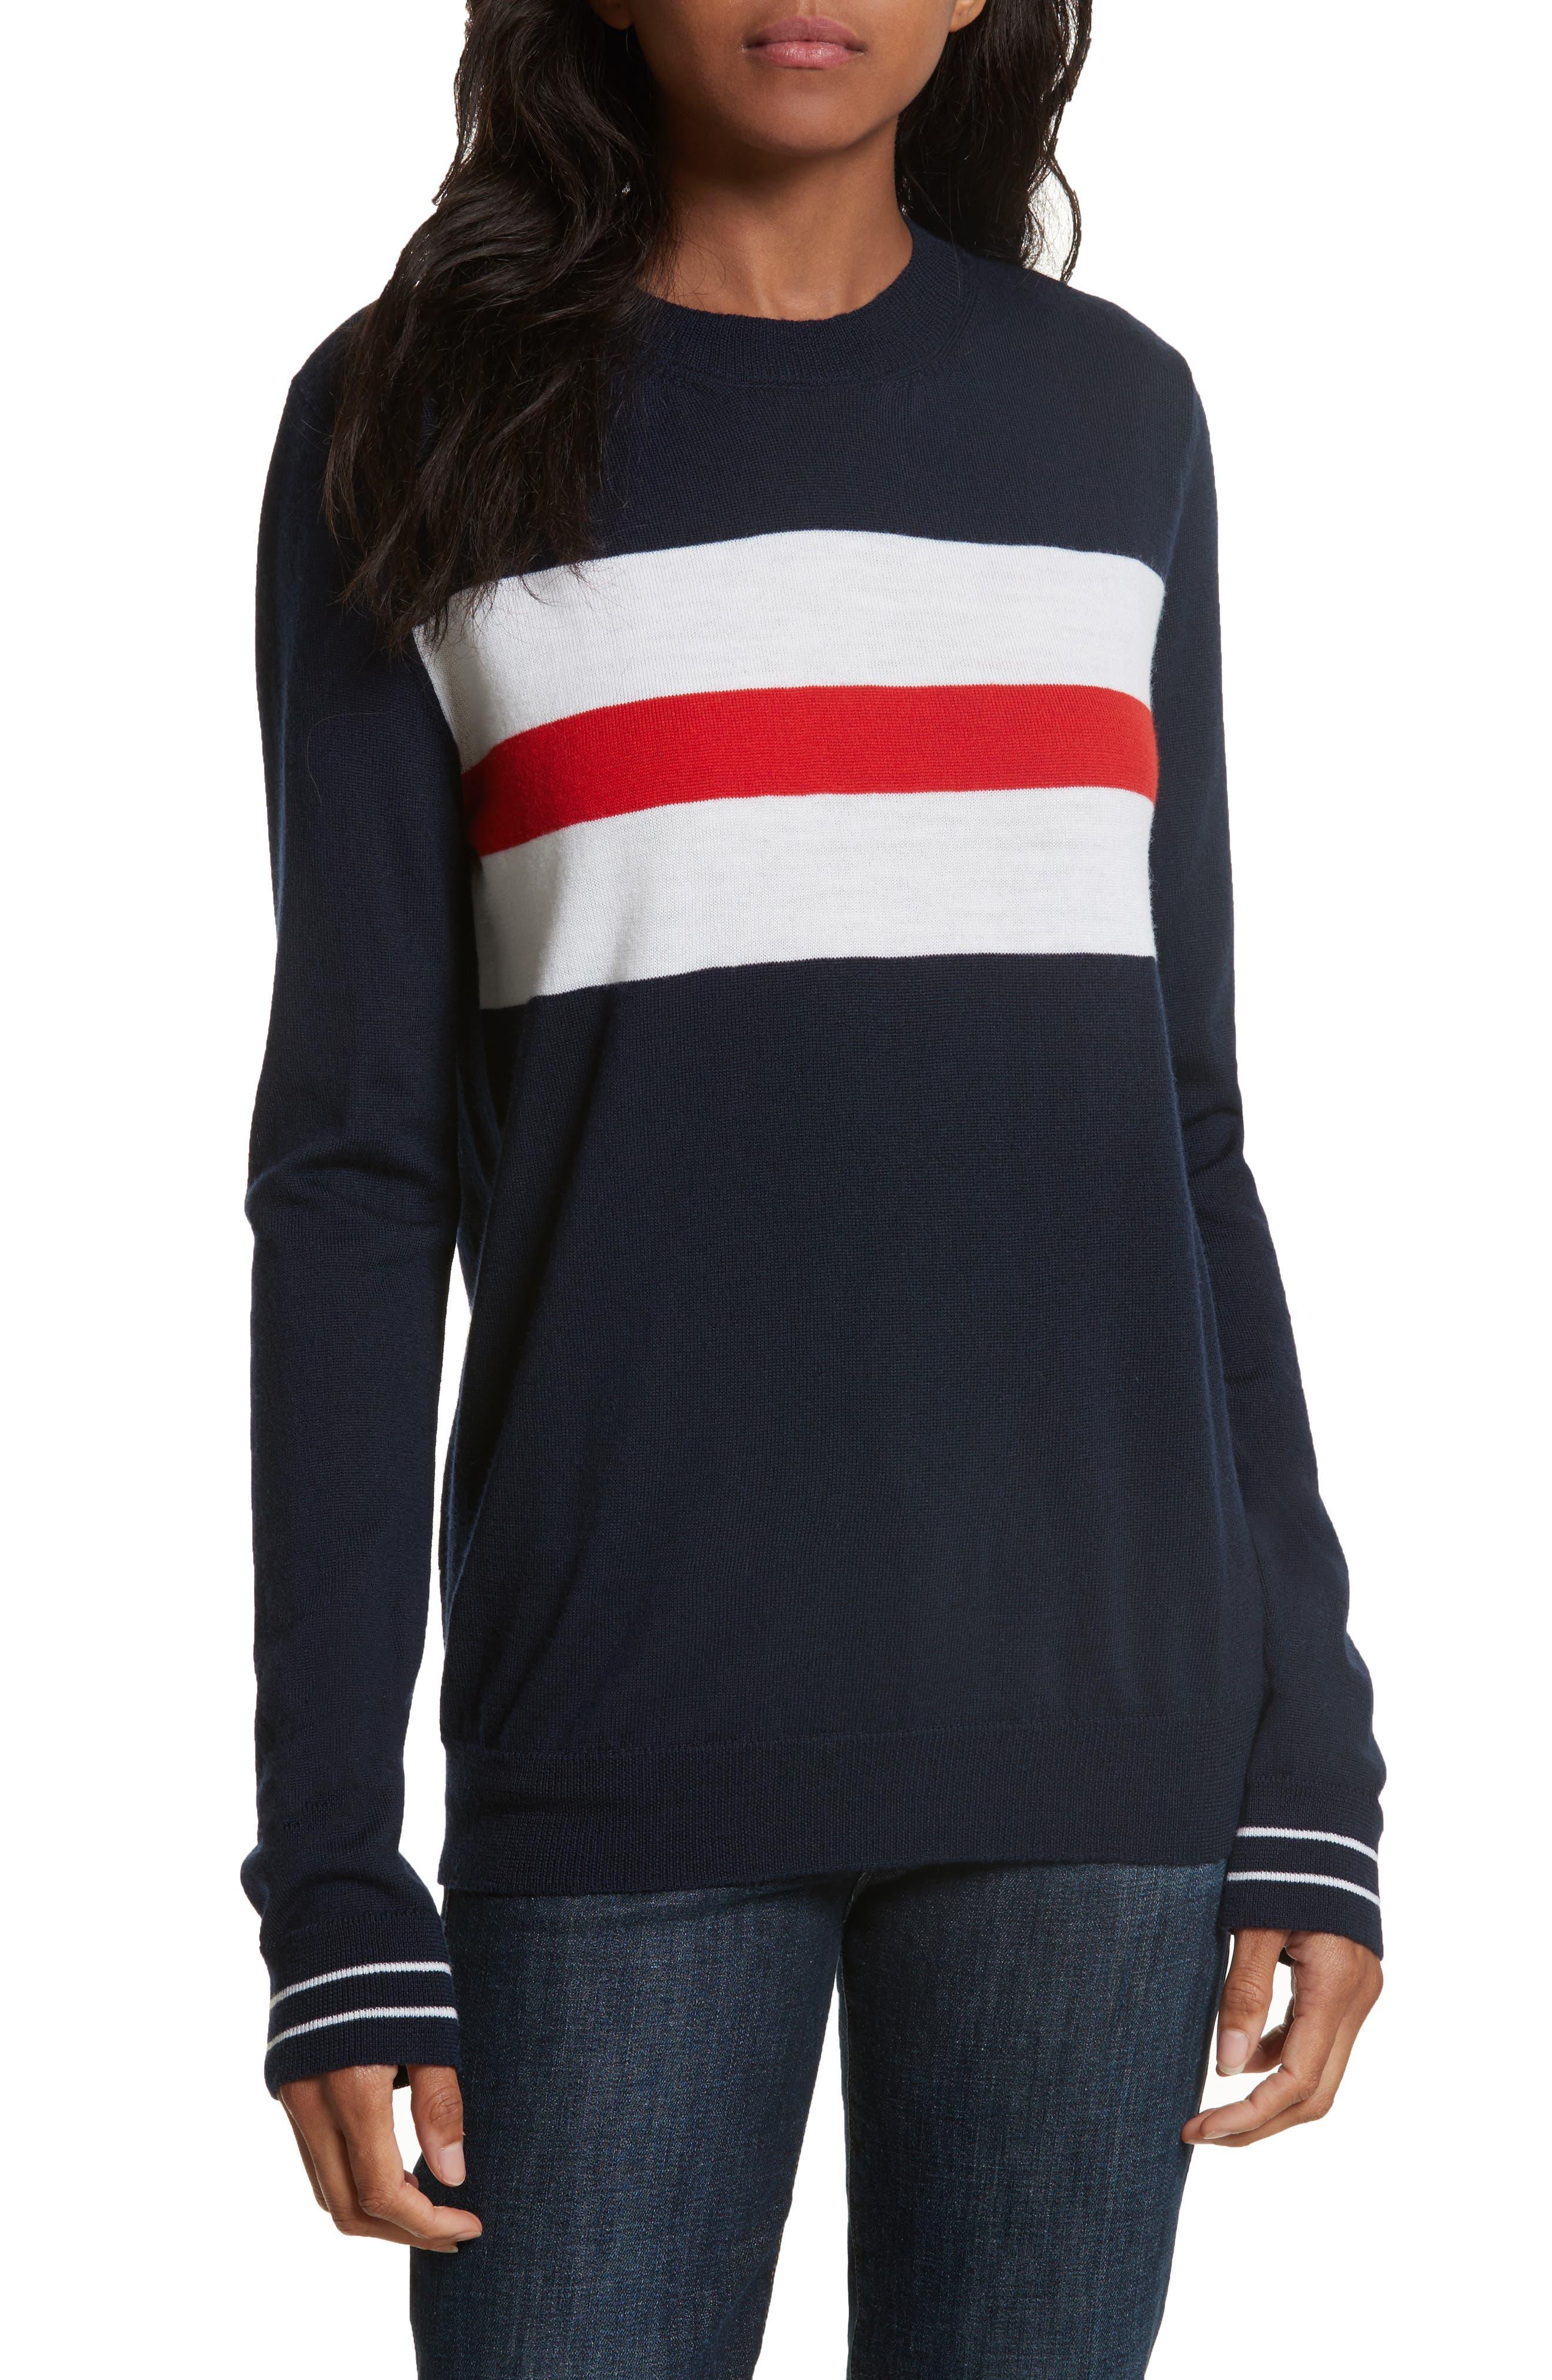 Alternate Image 1 Selected - être cécile Boyfriend Knit Merino Wool Sweater